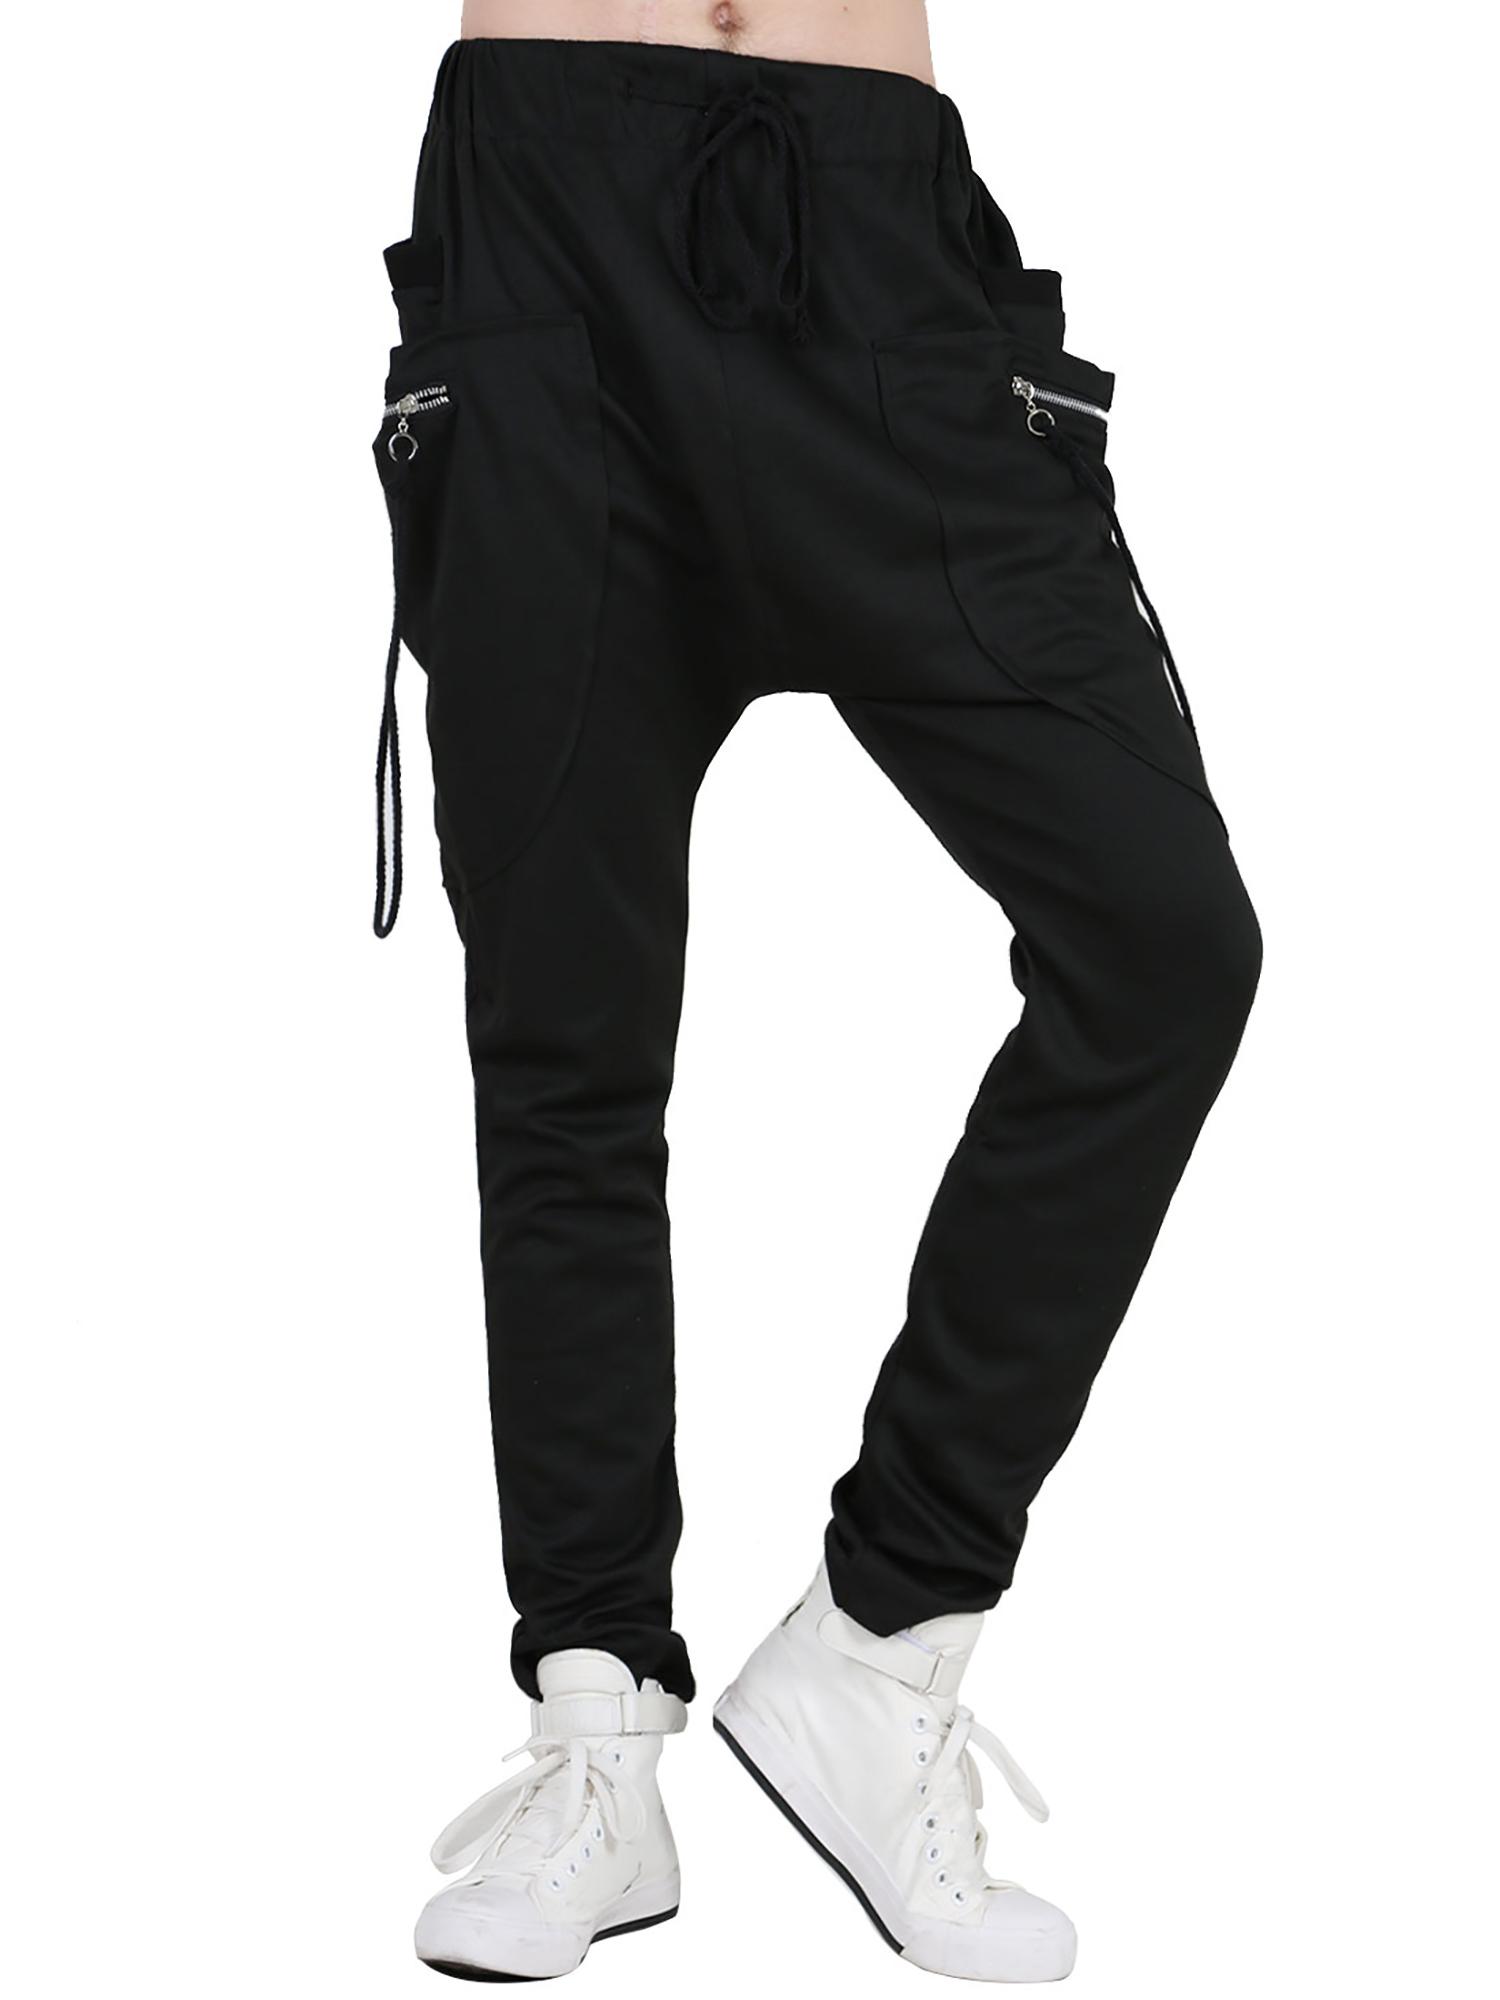 Men's Sports Wear Design Drawstring Waist Pants